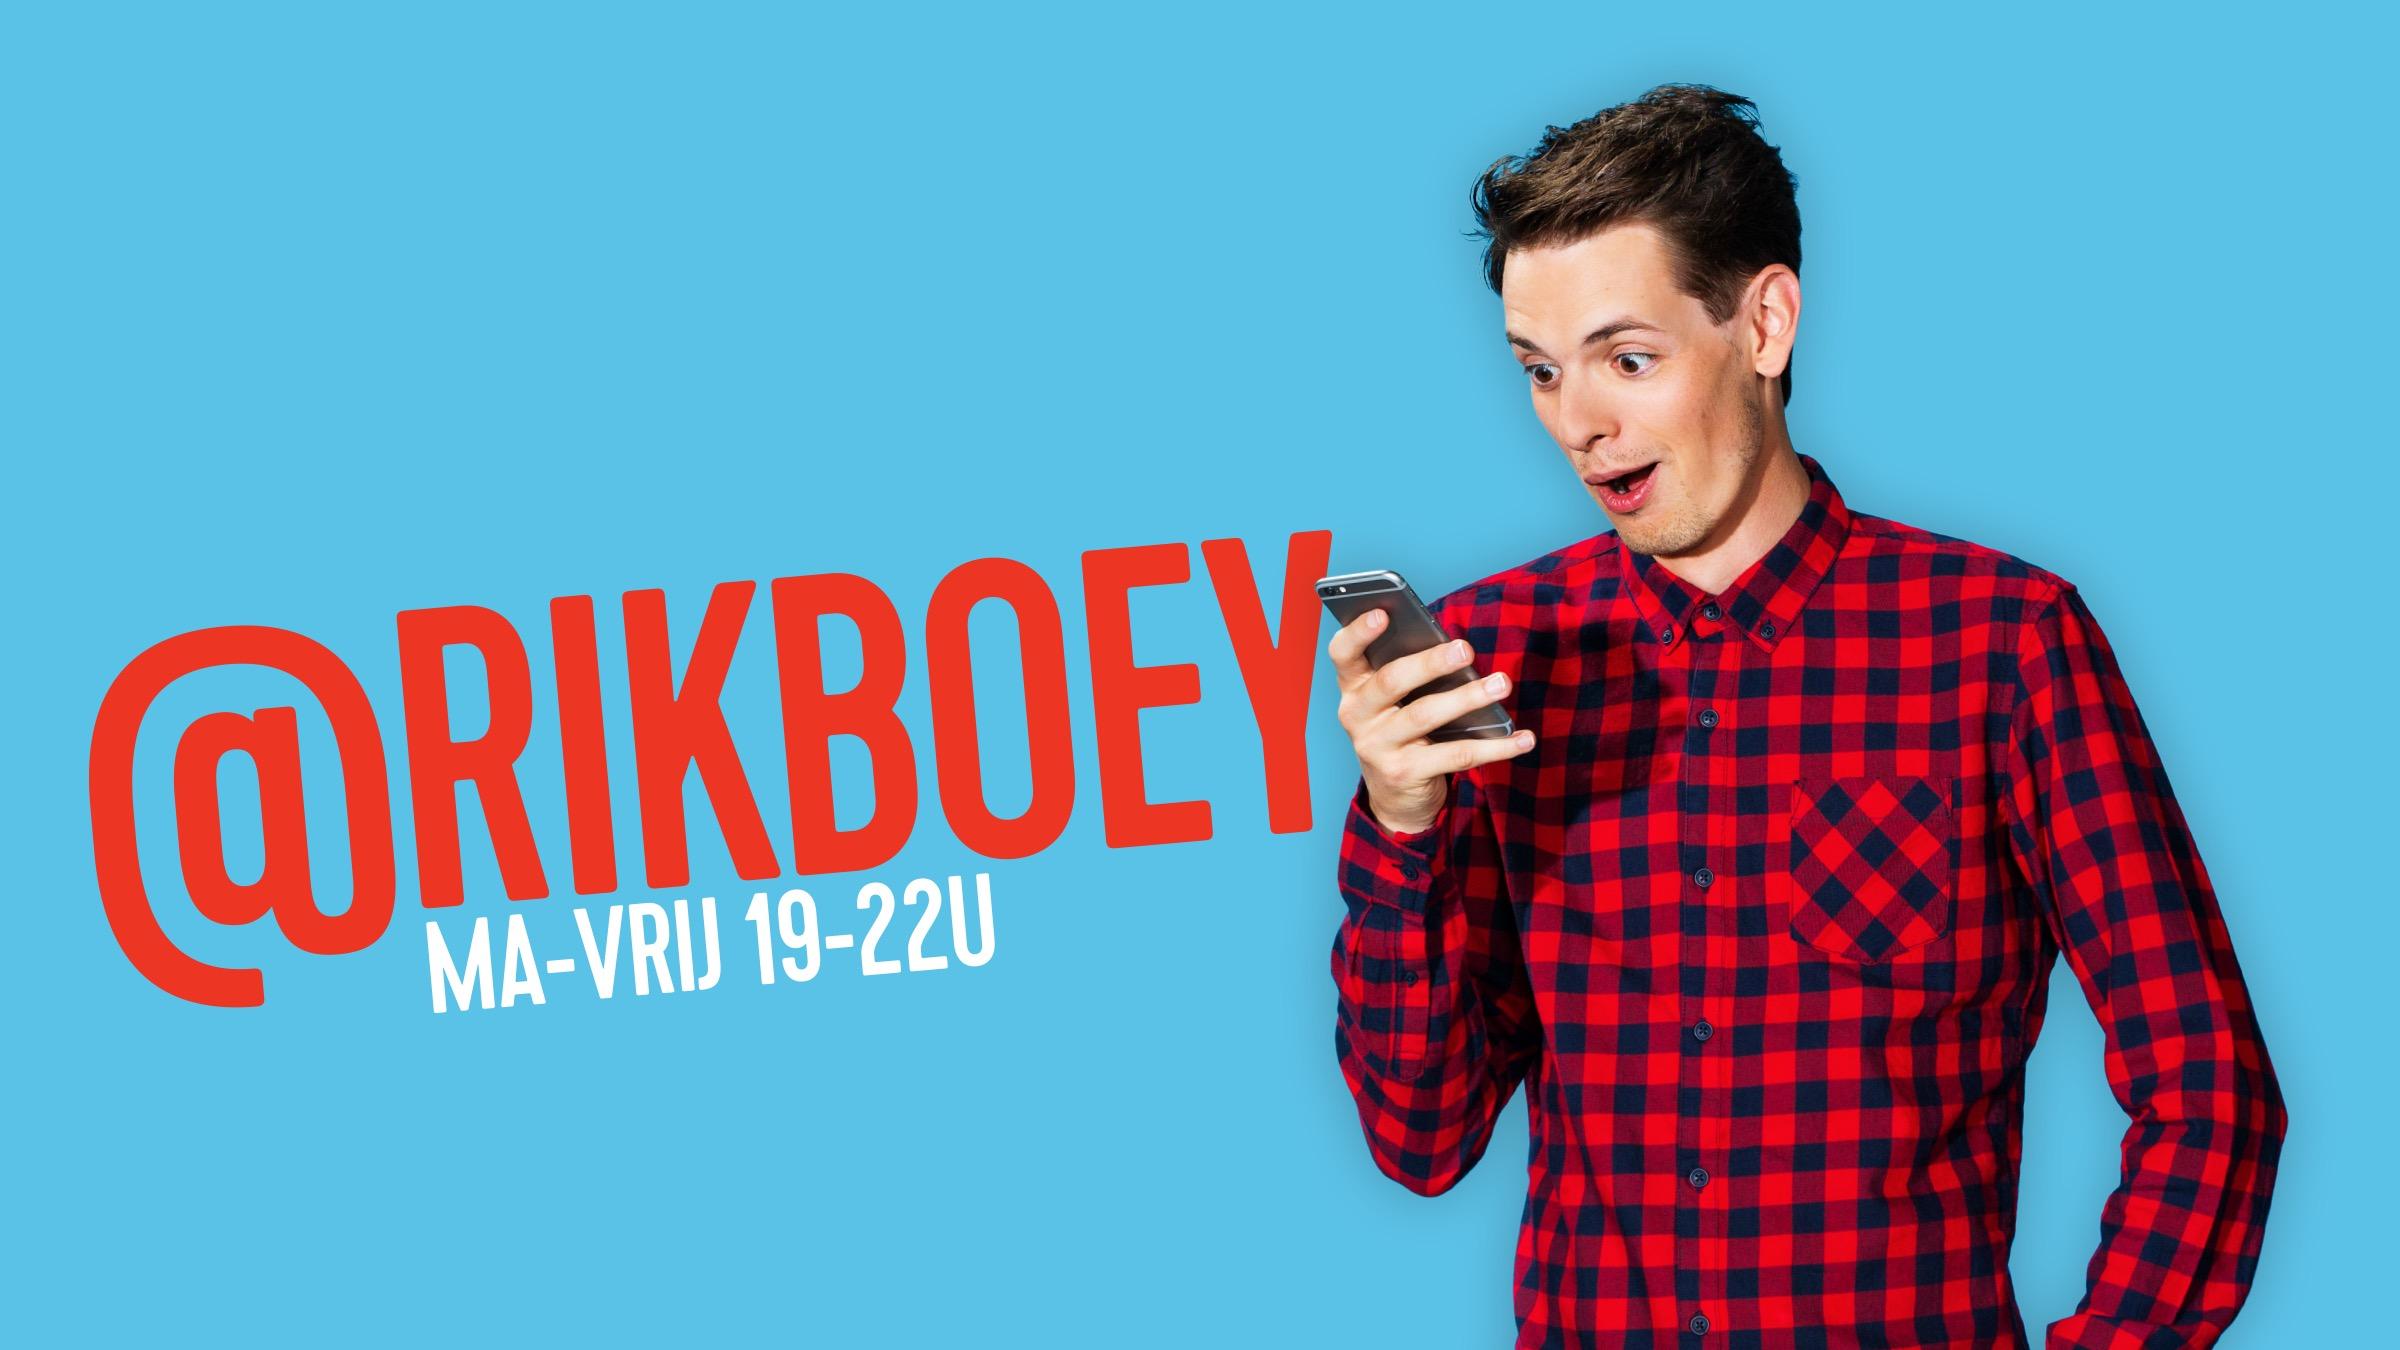 Rikboey